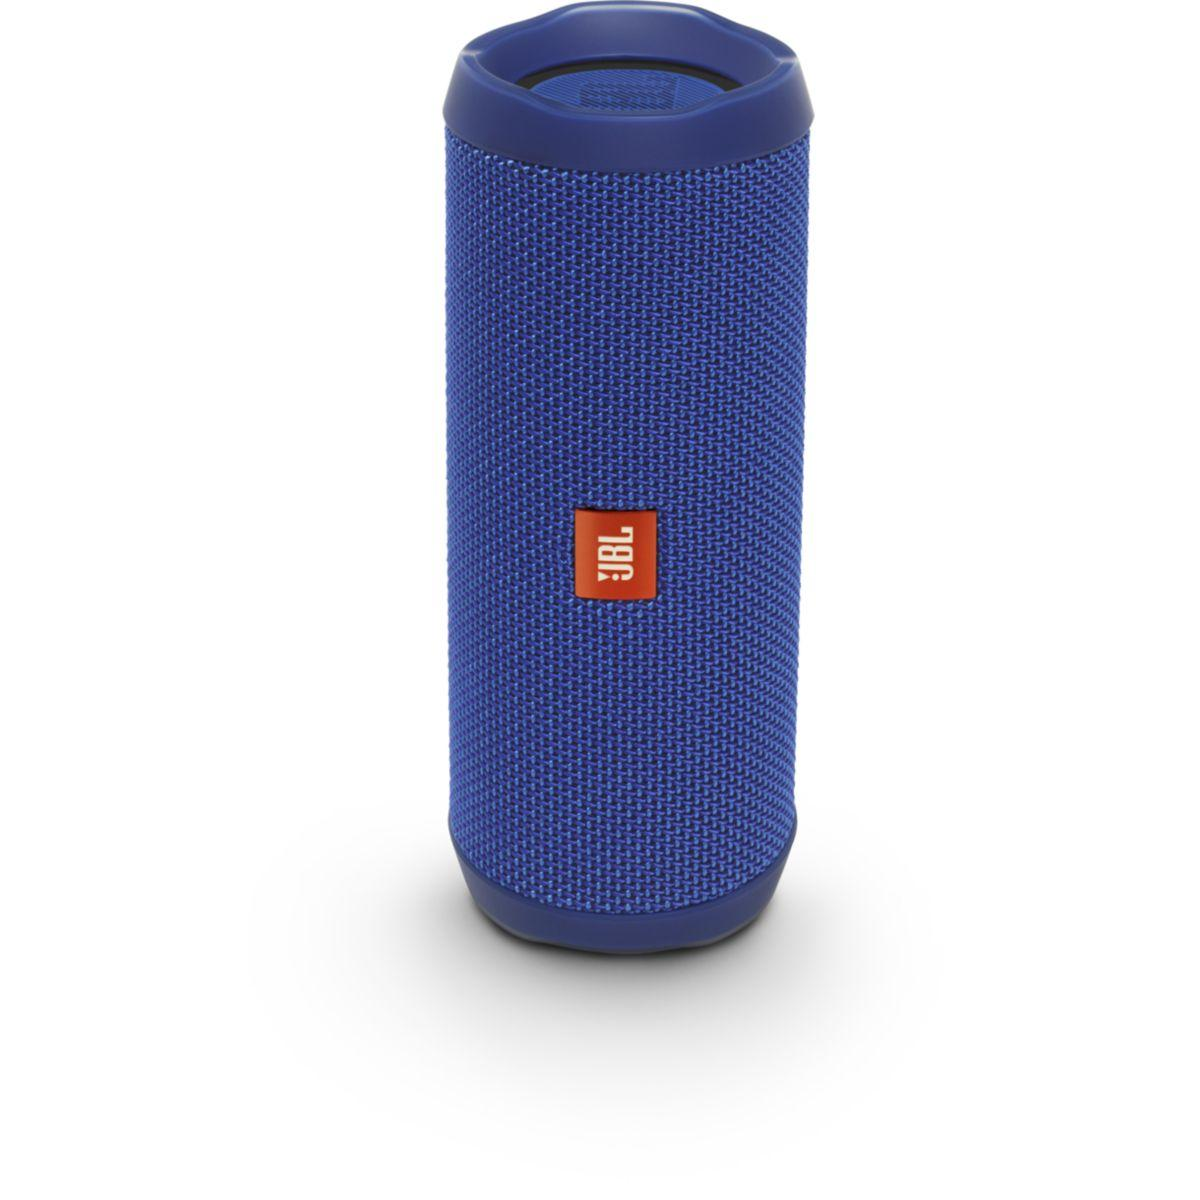 Enceinte bluetooth jbl flip 4 bleu - livraison offerte : code livprem (photo)